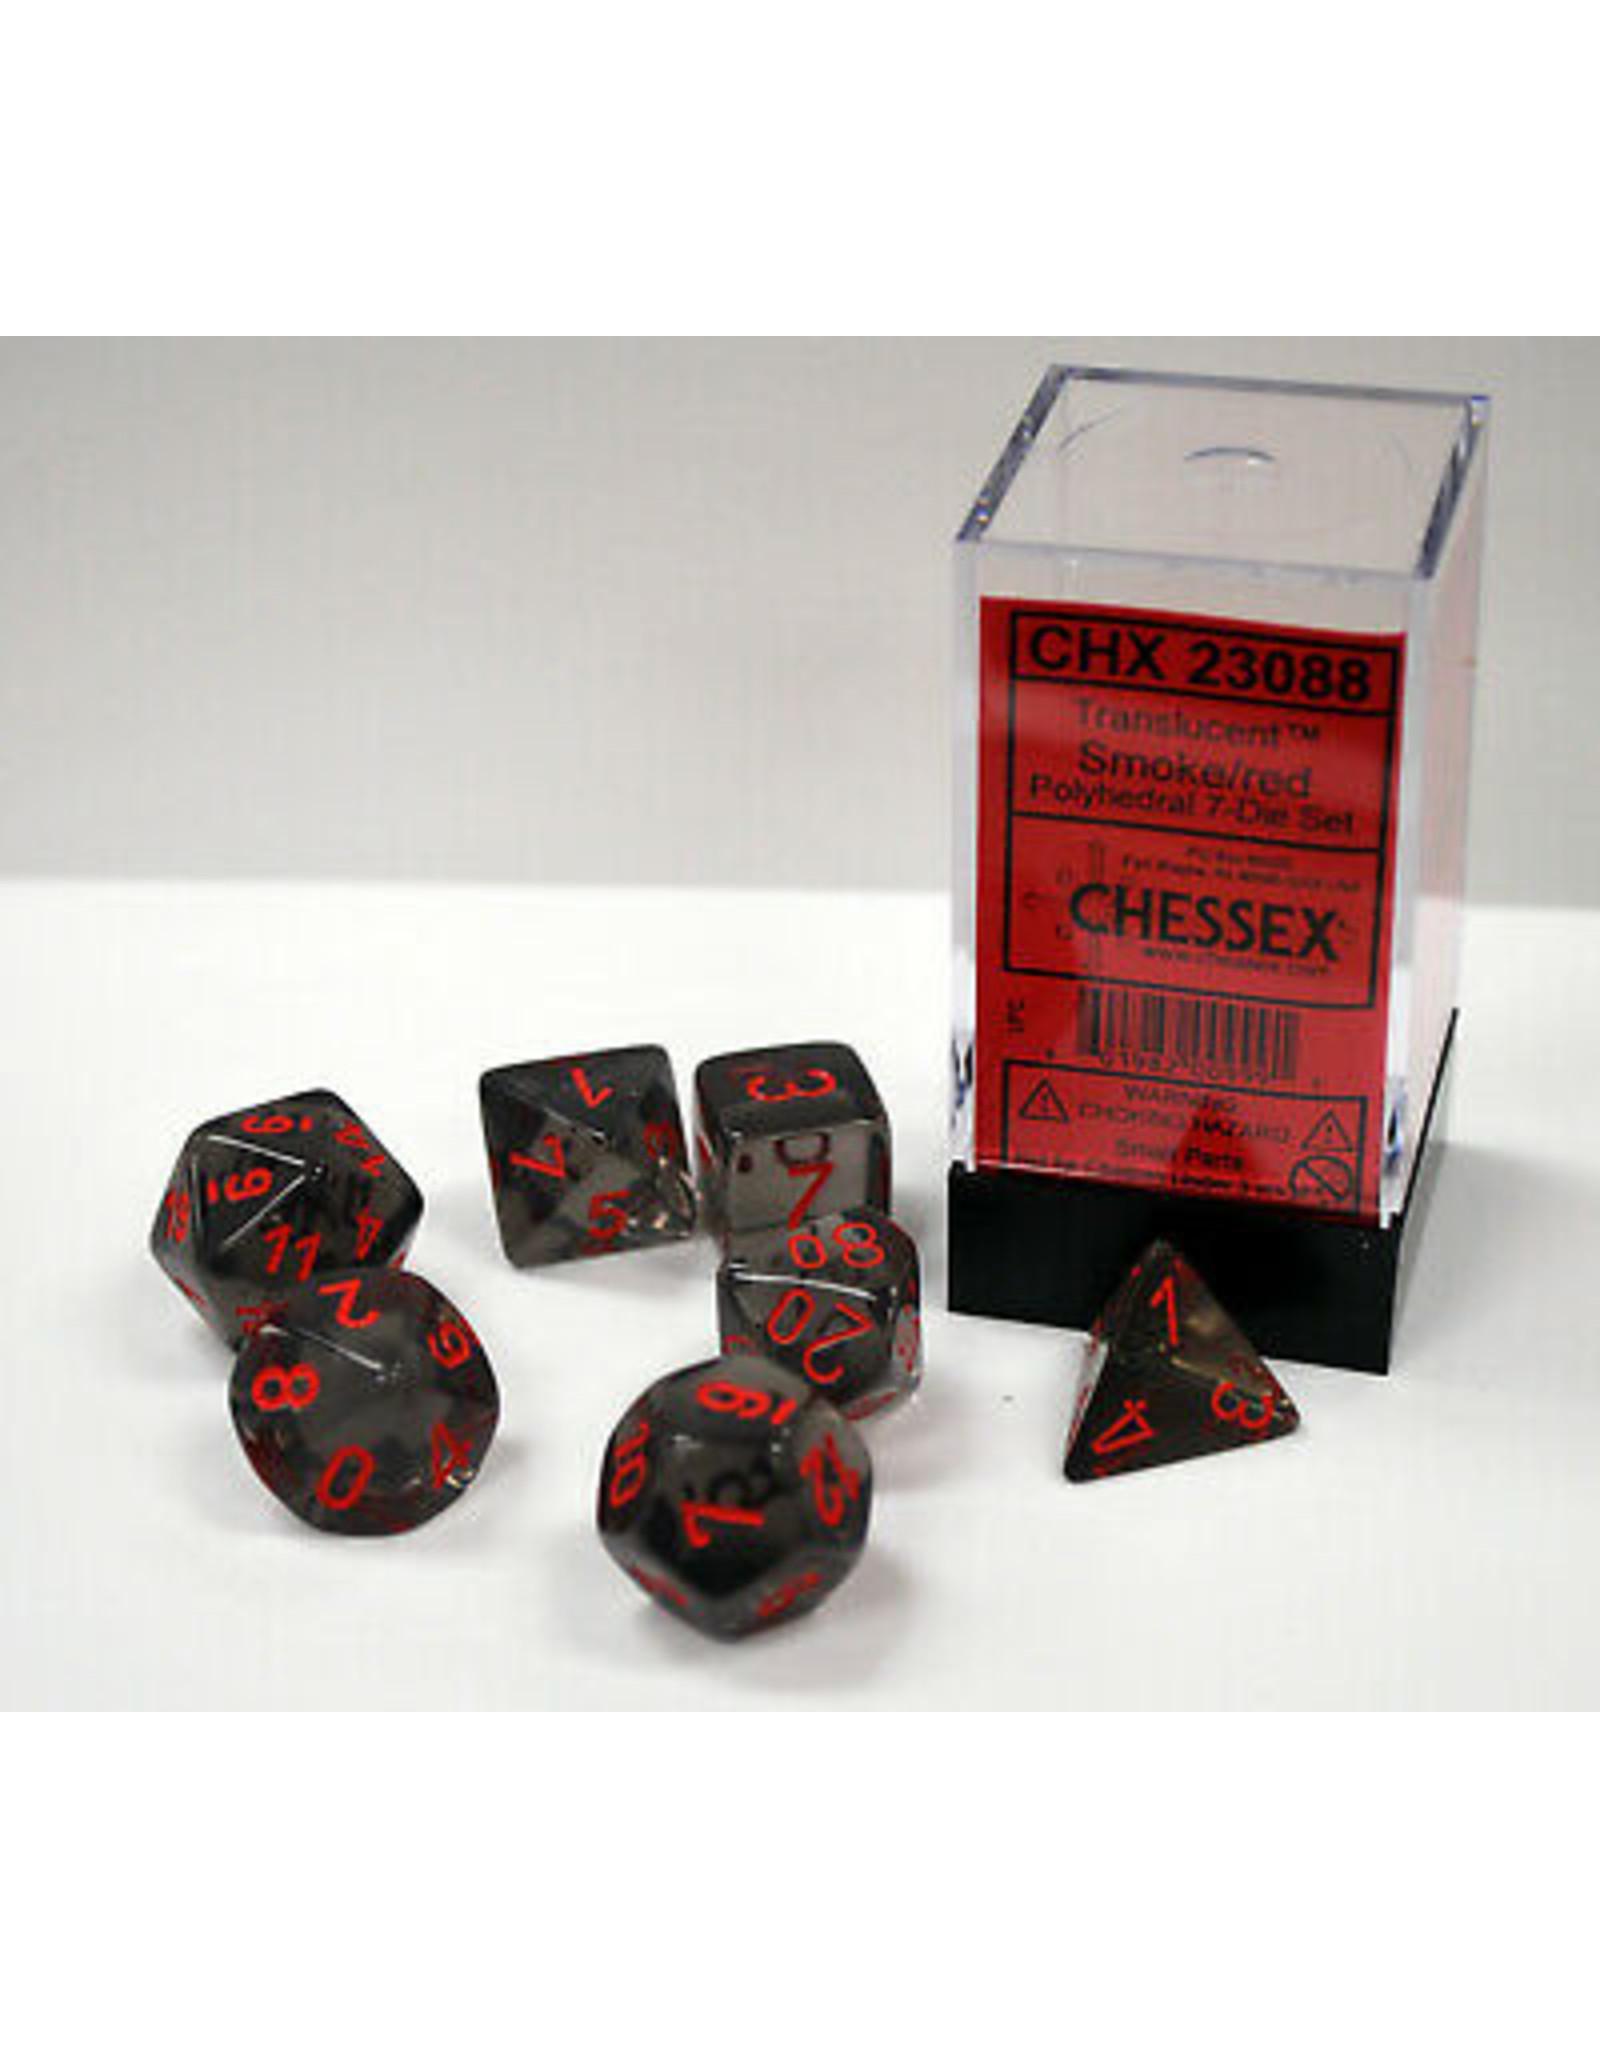 Chessex Translucent Smoke/Red Set (7)